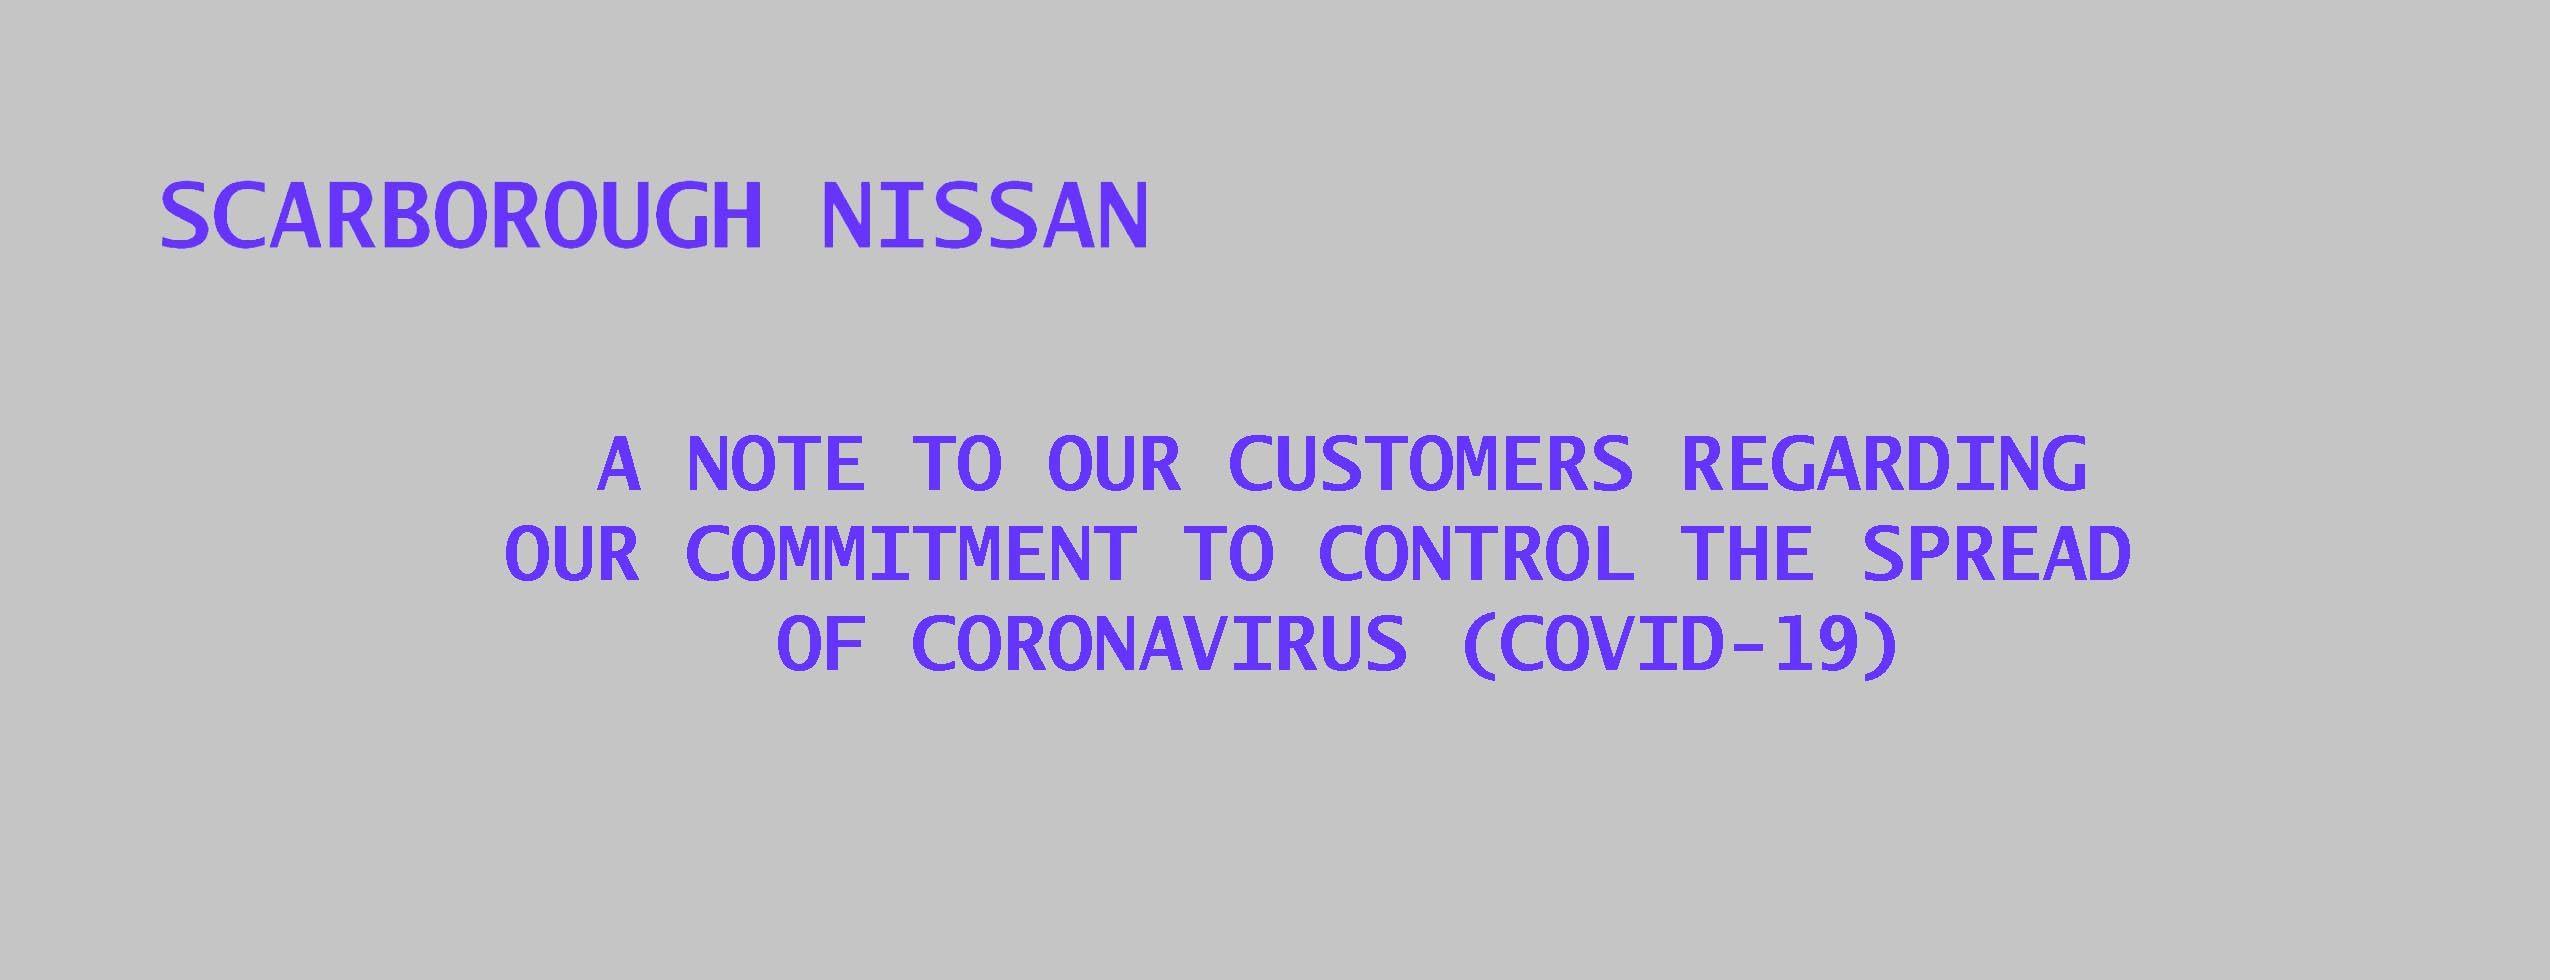 SCARBOROUGH NISSAN COVID-19 CONTROL SPREAD